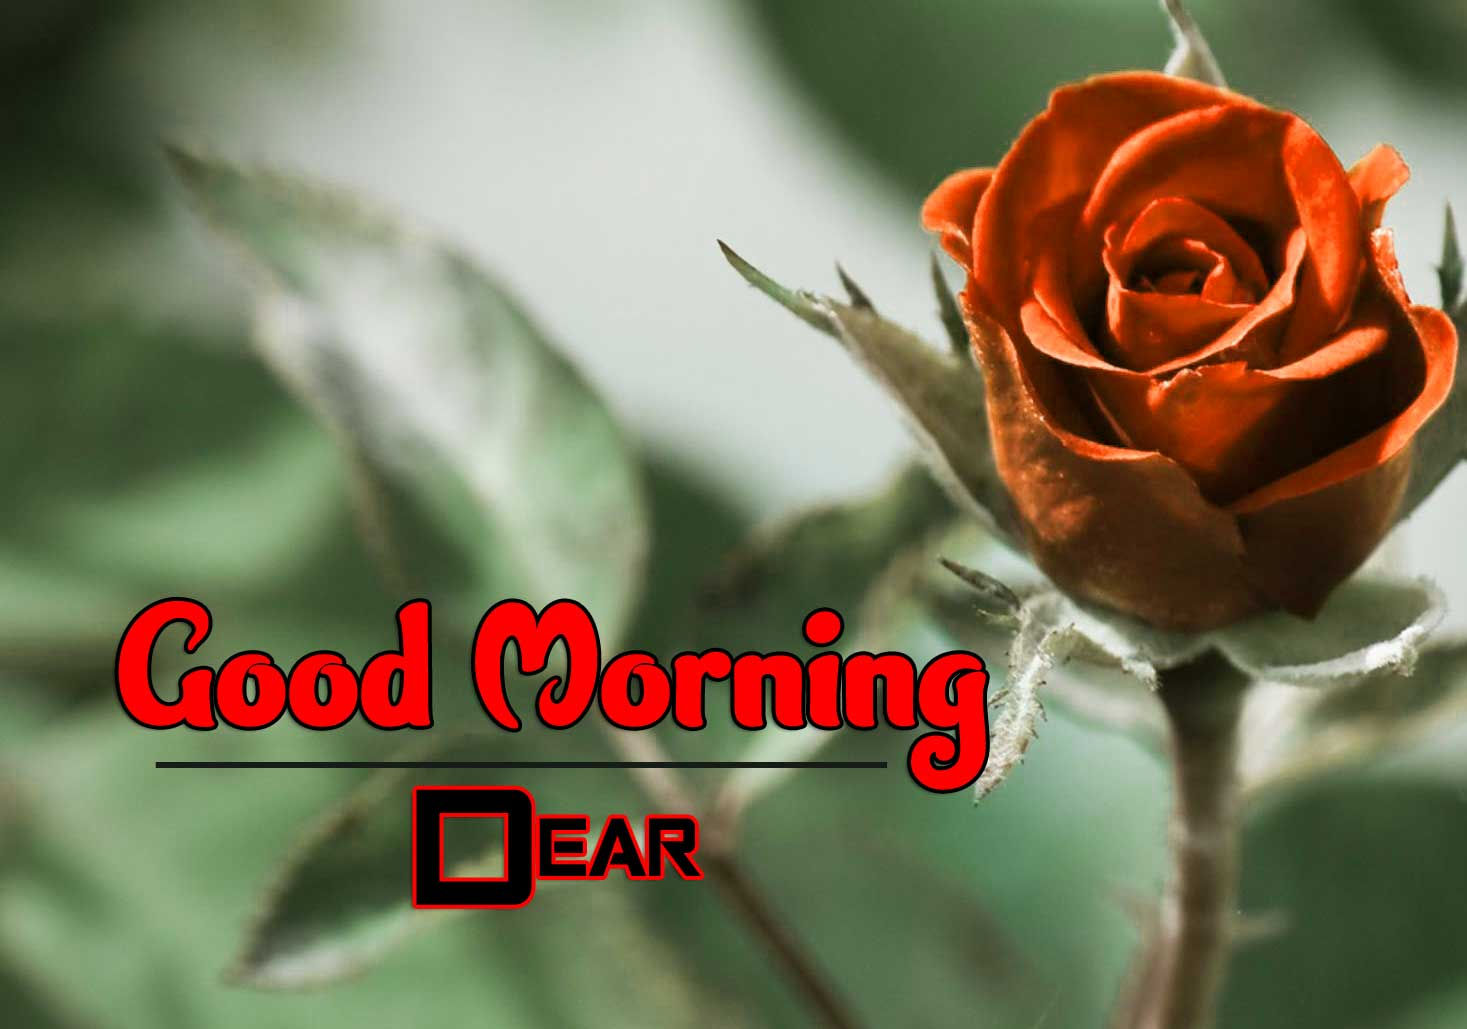 With Rose Free Wonderful Good Morning 4k Pics Images